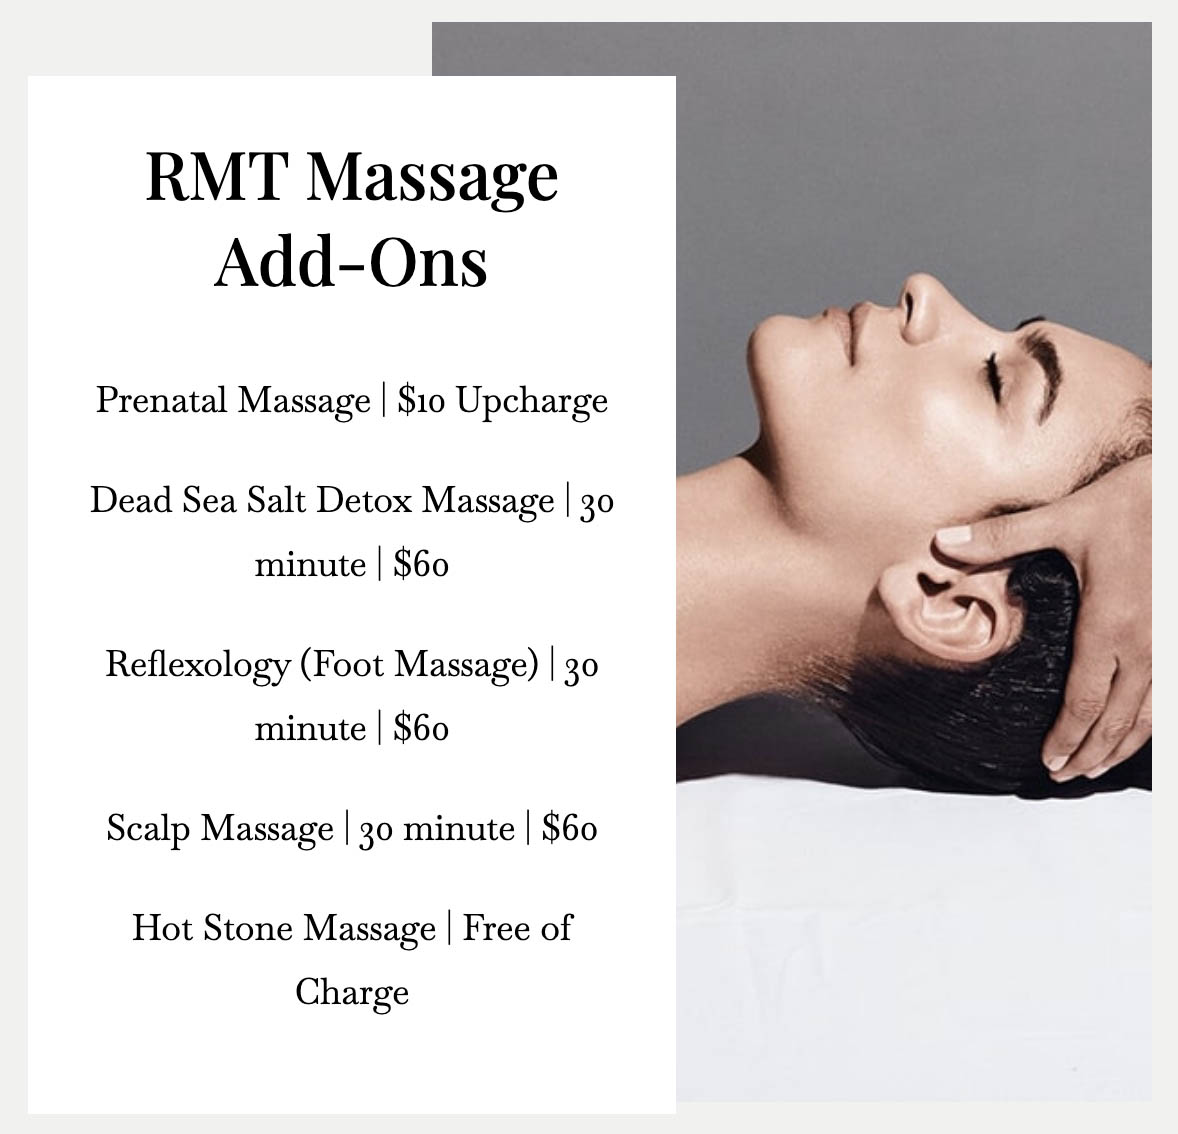 Massage price addon 1 in Vaughan